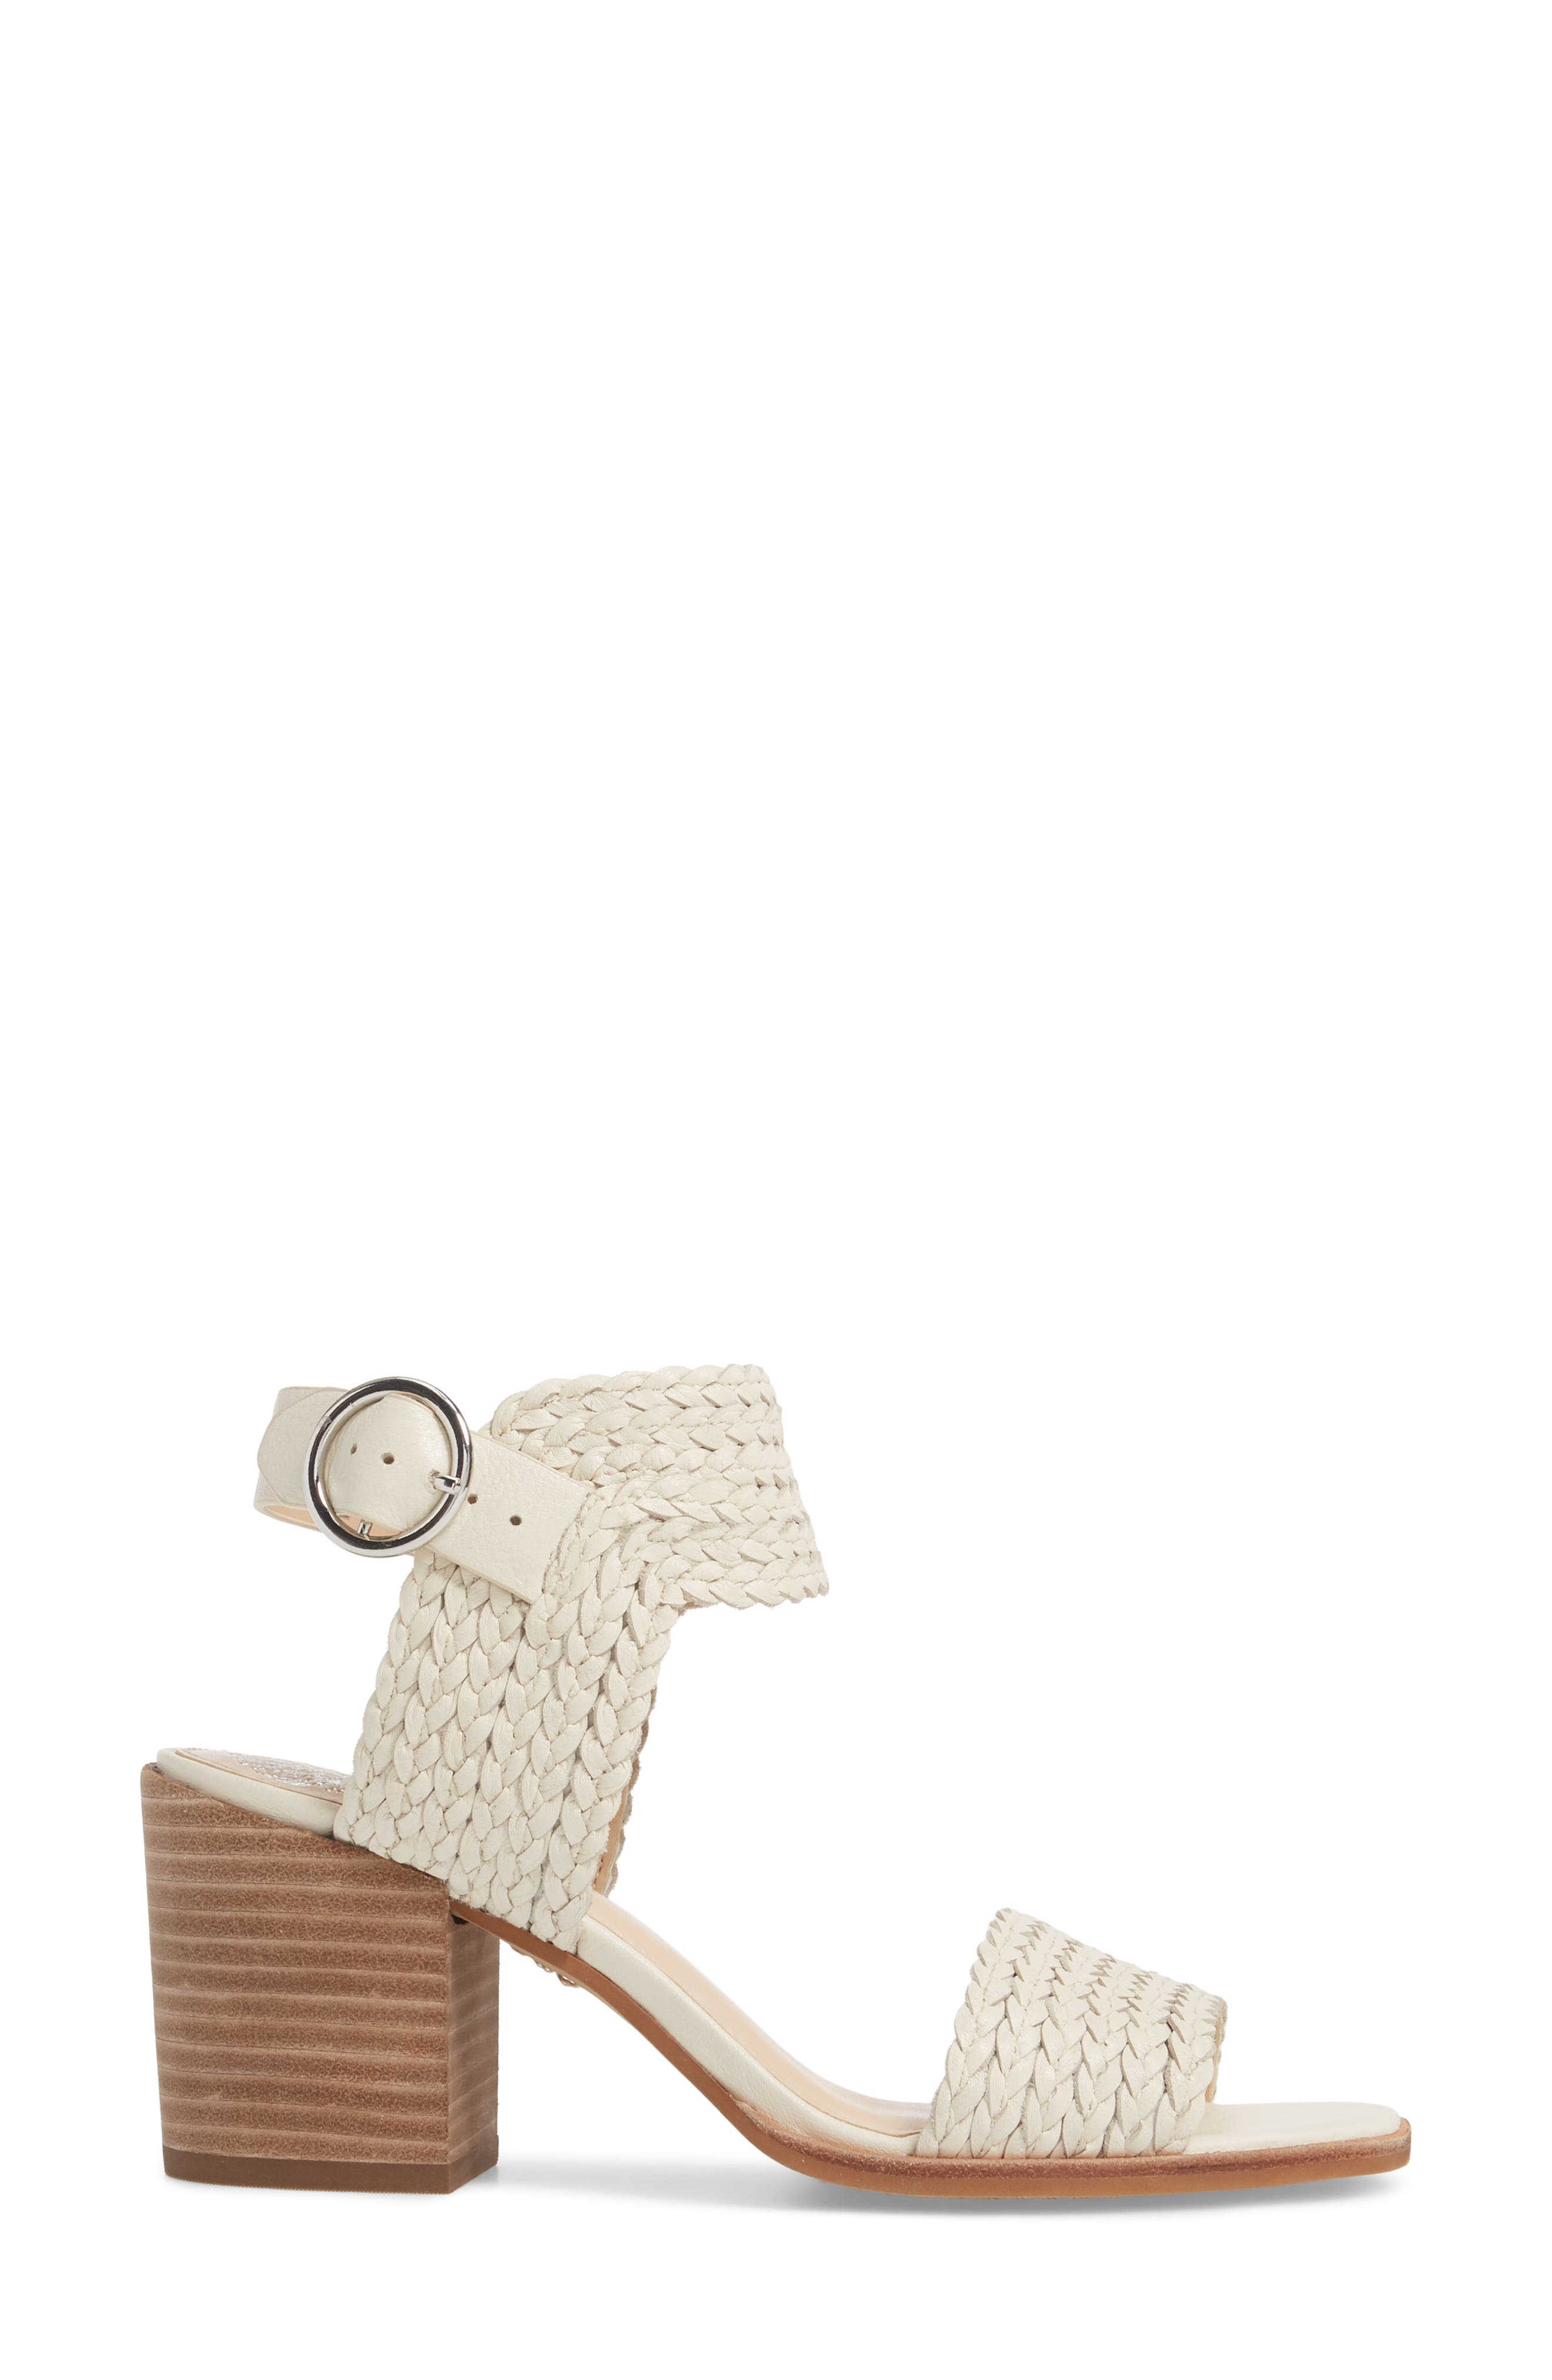 Kolema Sandal,                             Alternate thumbnail 3, color,                             Vanilla Fabric